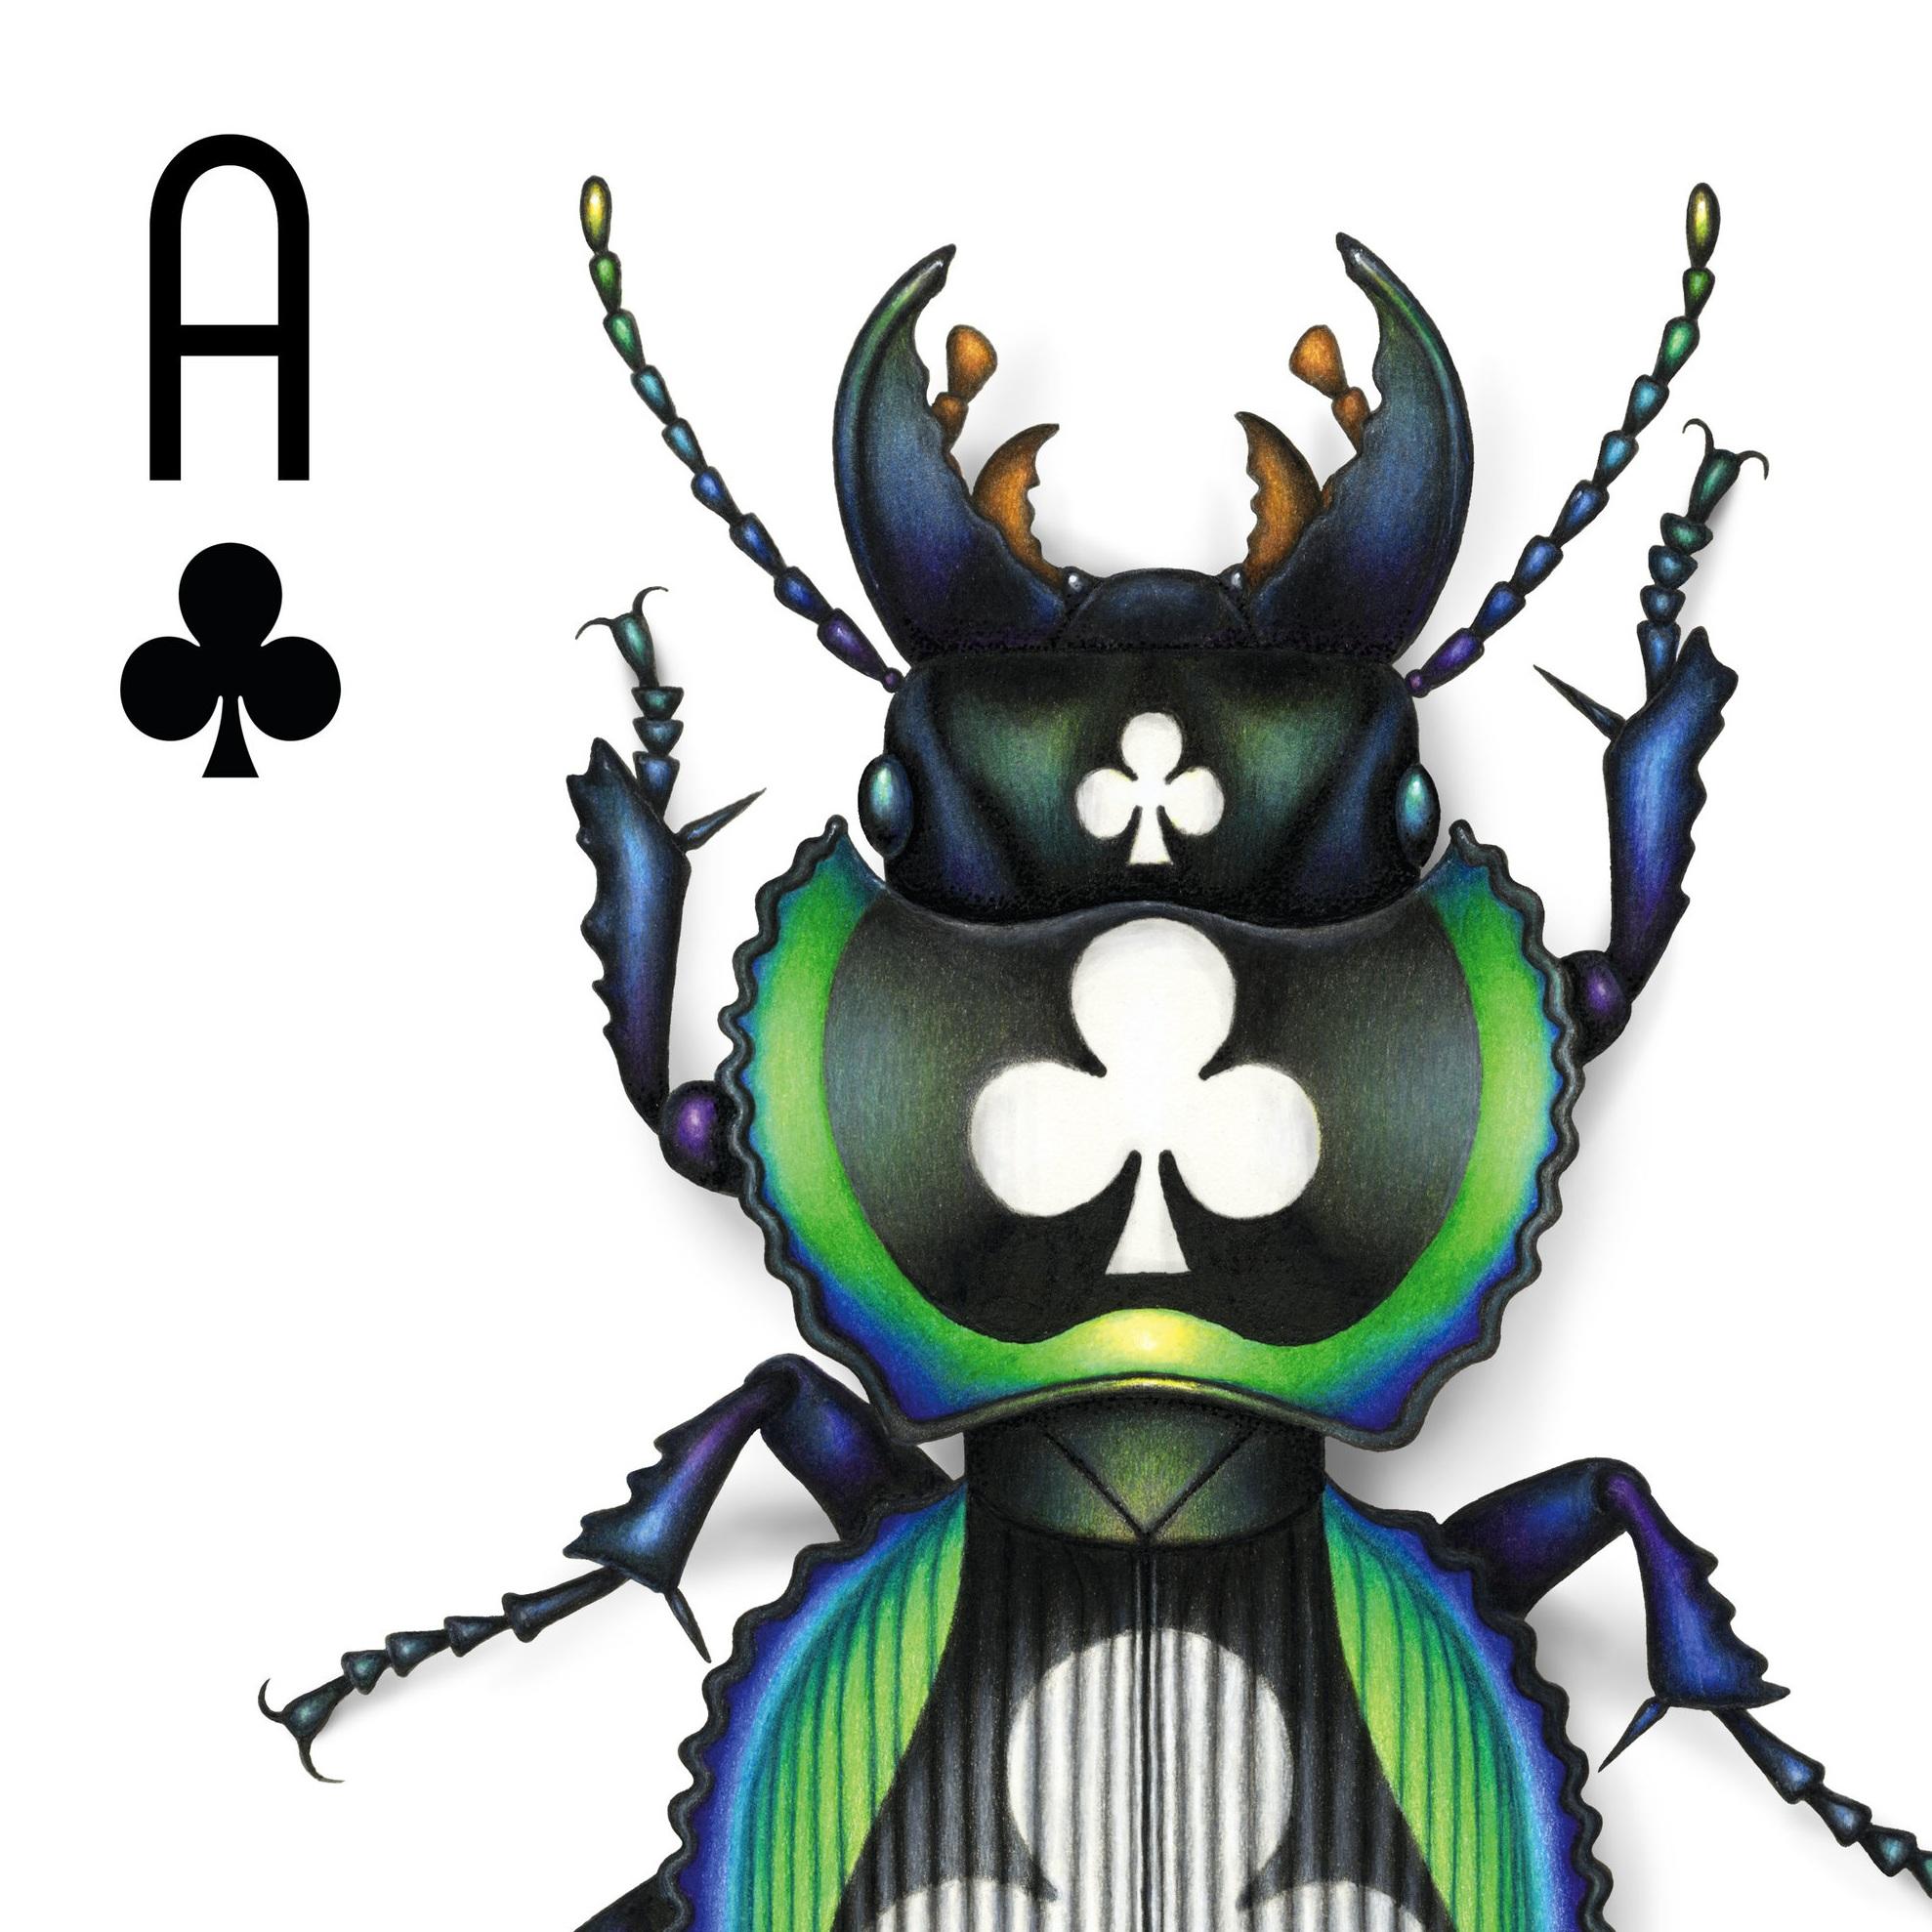 Deck-dwelling Coleoptera - beetles